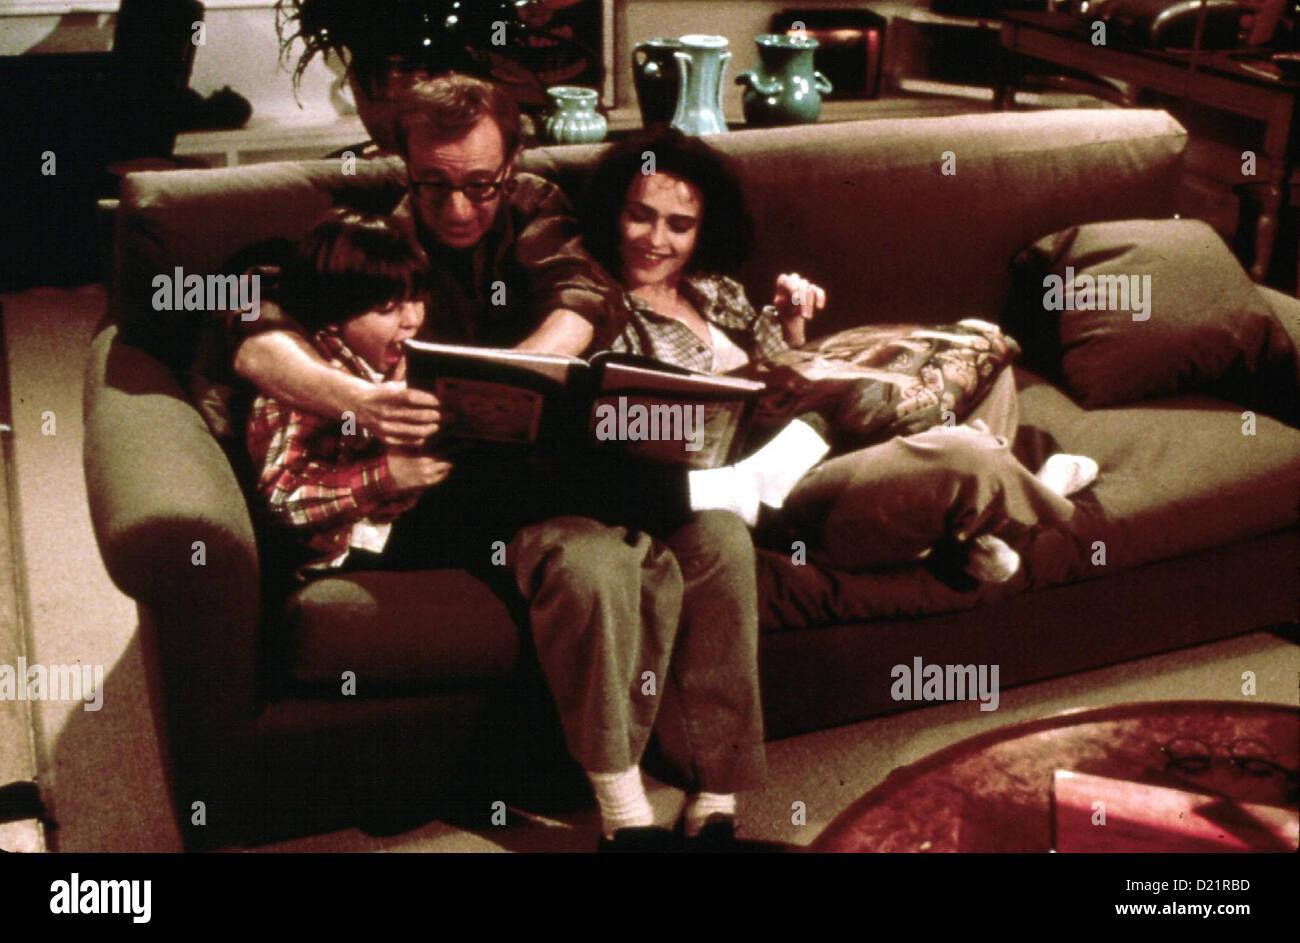 Geliebte Aphrodite  Mighty Aphrodite  Jimmy McQuaid, Woody Allen, Helena Bonham Carter Max (Jimmy McQuaid,l) beeindruckt - Stock Image